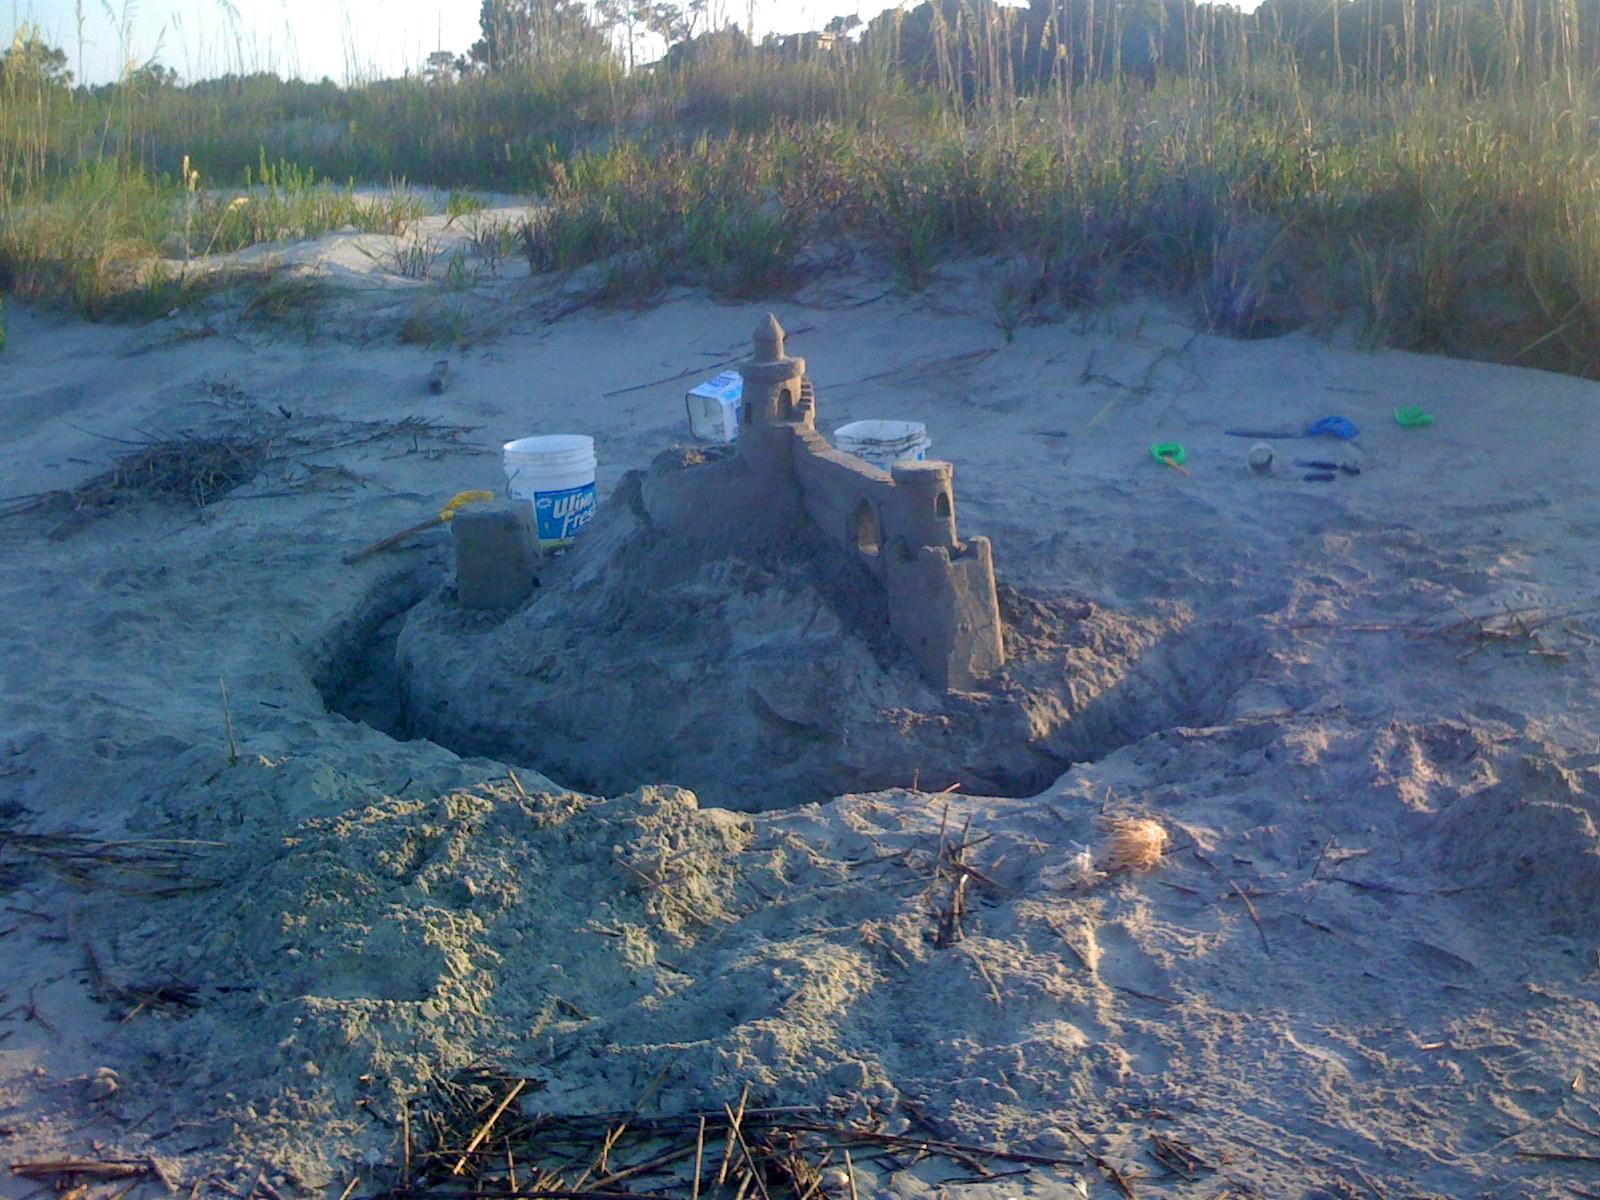 Sandcastle found on Dewees Inlet side of Dewees Island